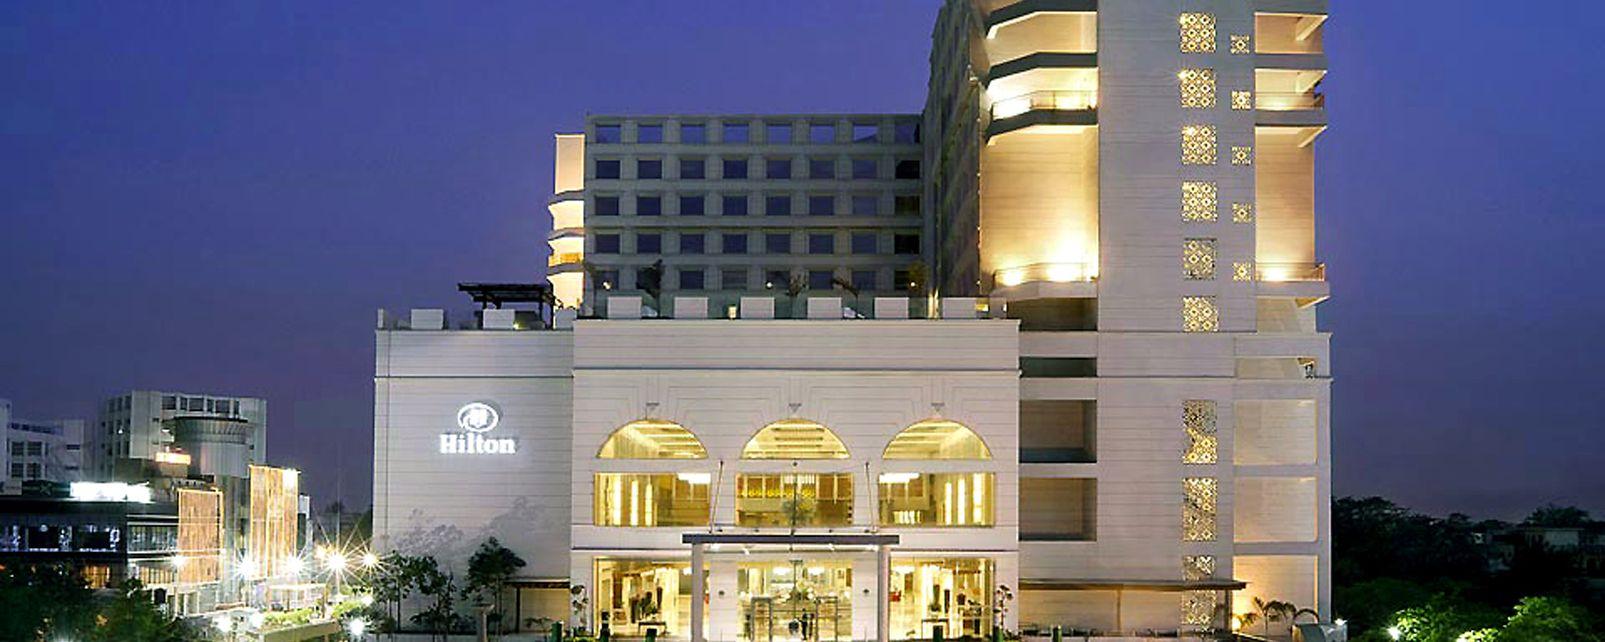 Hôtel Hilton New Delhi Janakpuri